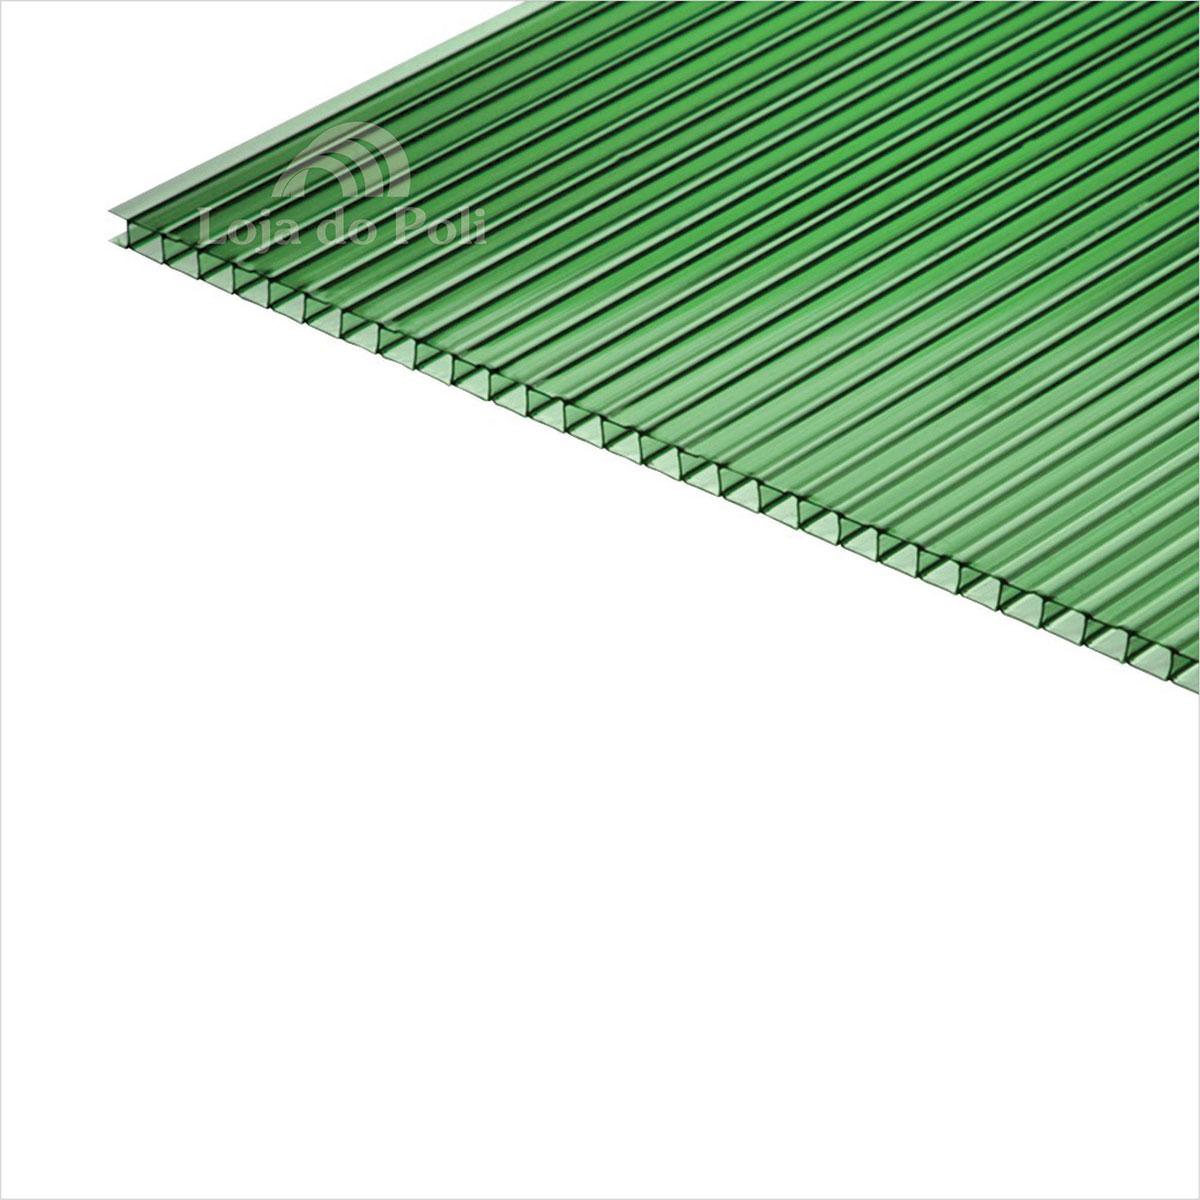 Chapa Policarbonato Alveolar Verde 4mm 1,0x6,0m